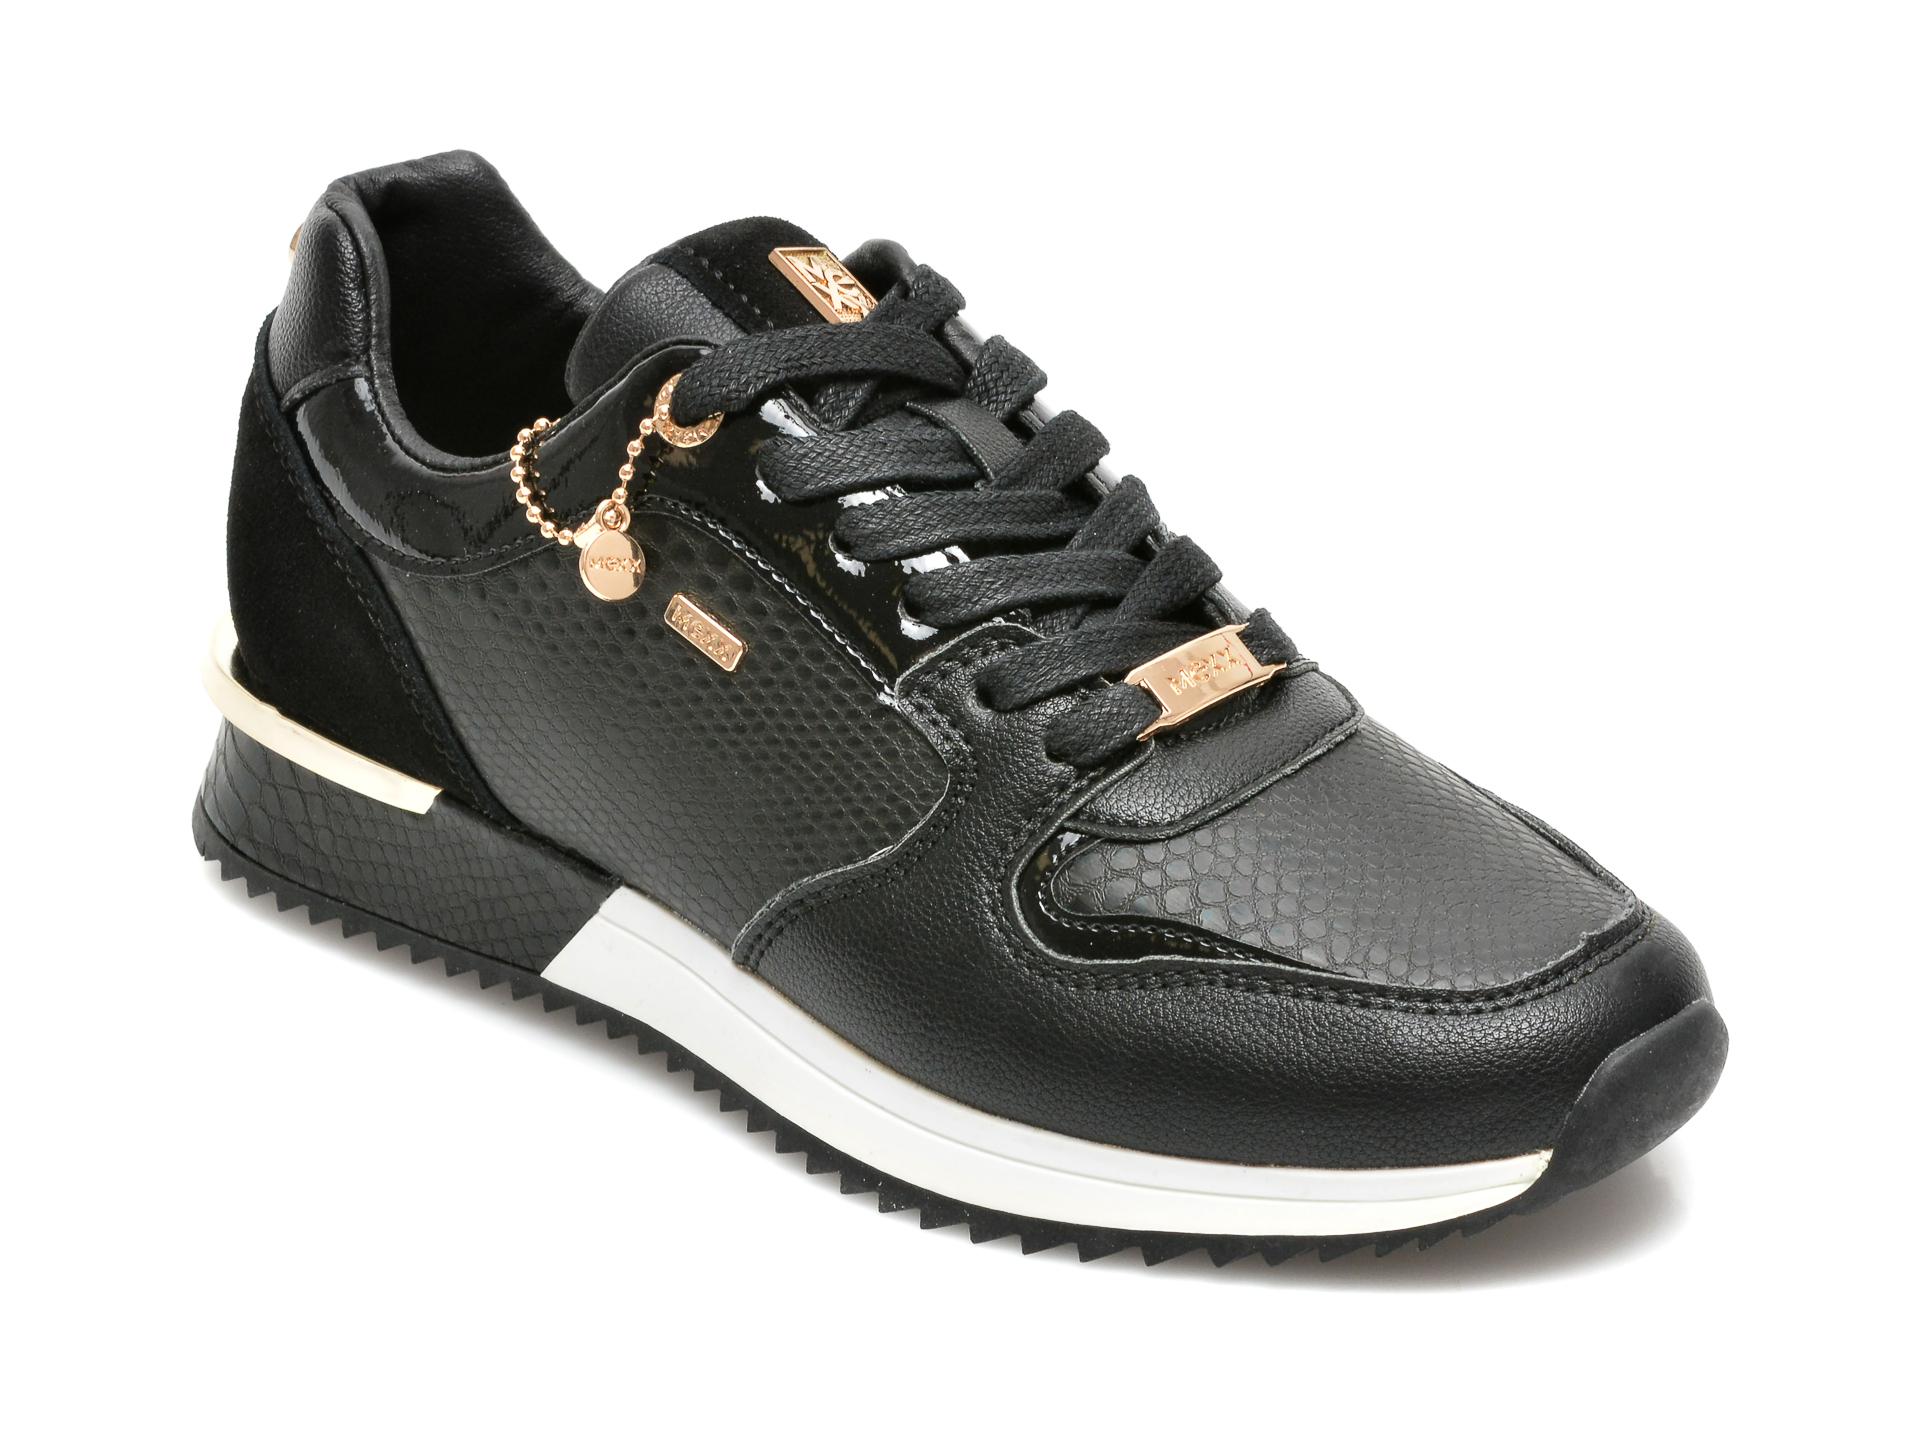 Pantofi sport MEXX negri, K0189, din piele ecologica